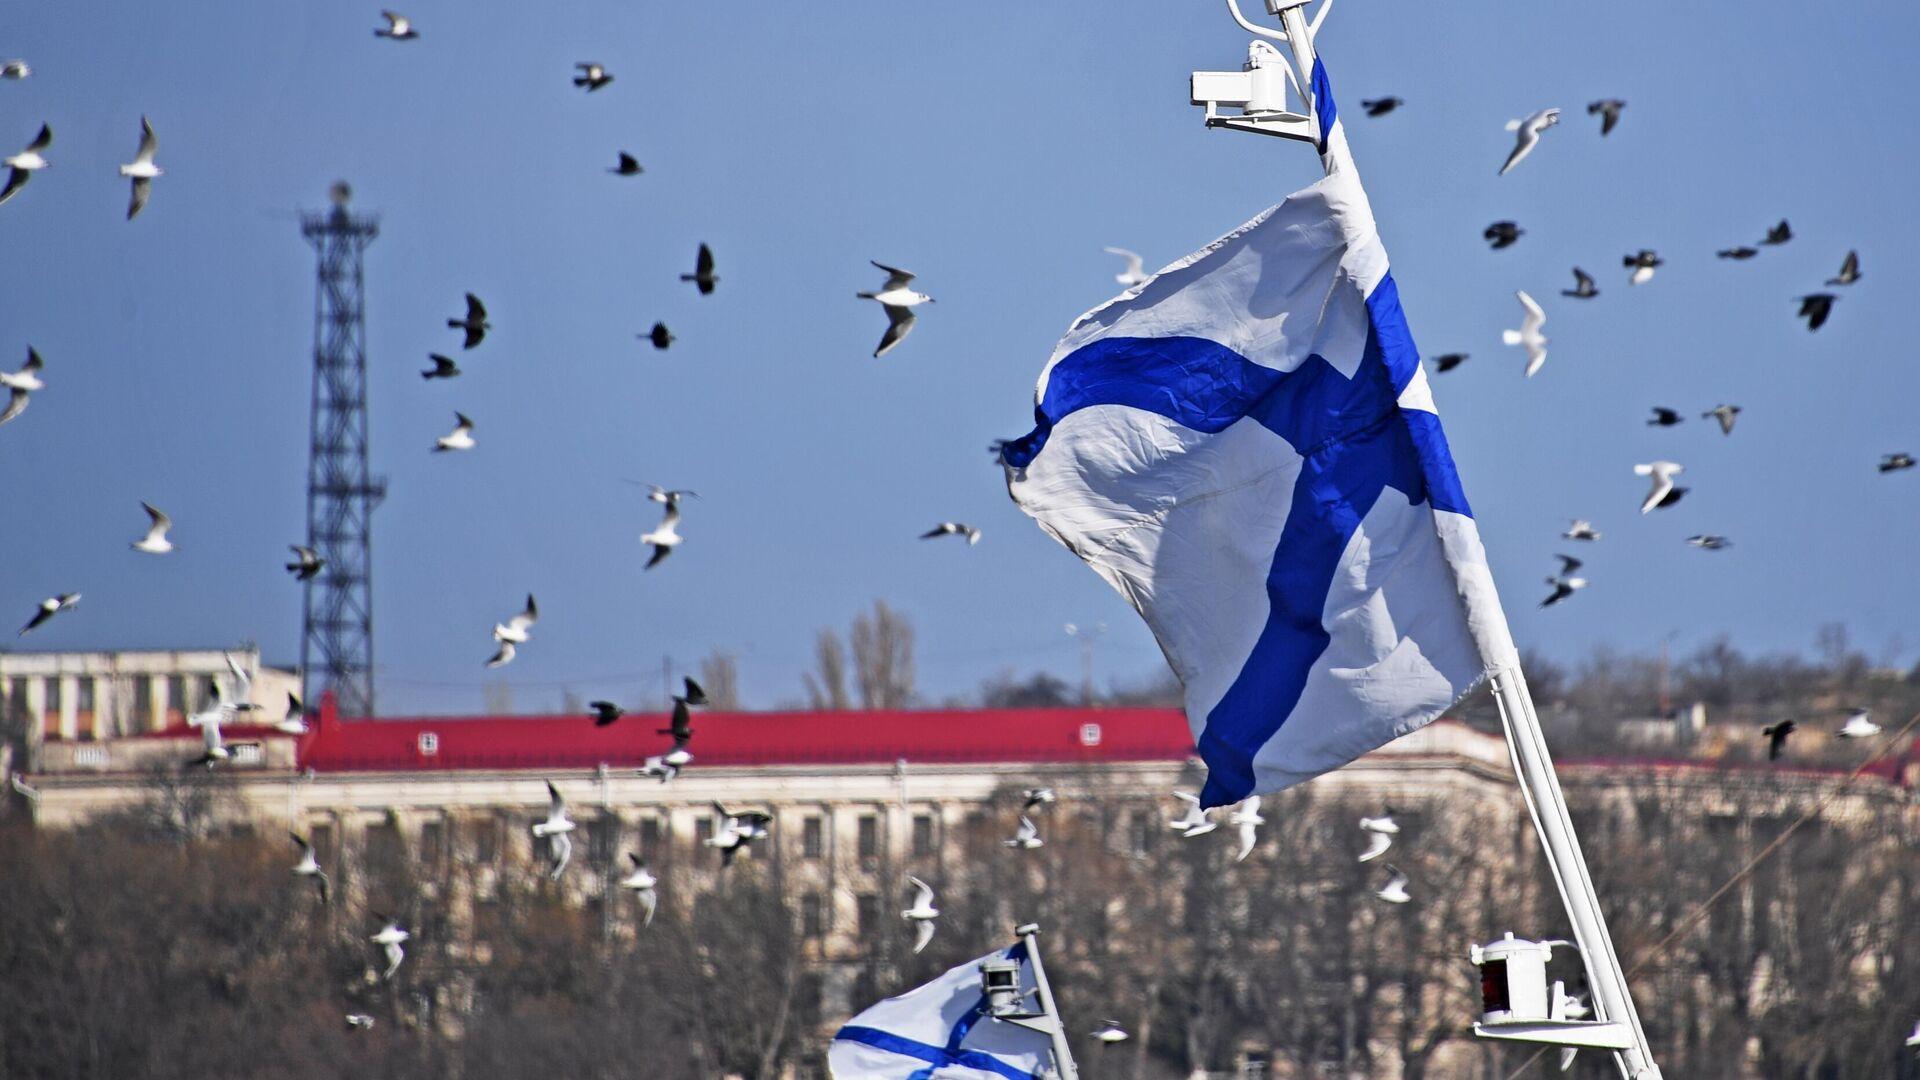 Андреевский флаг в Севастополе - РИА Новости, 1920, 03.12.2020